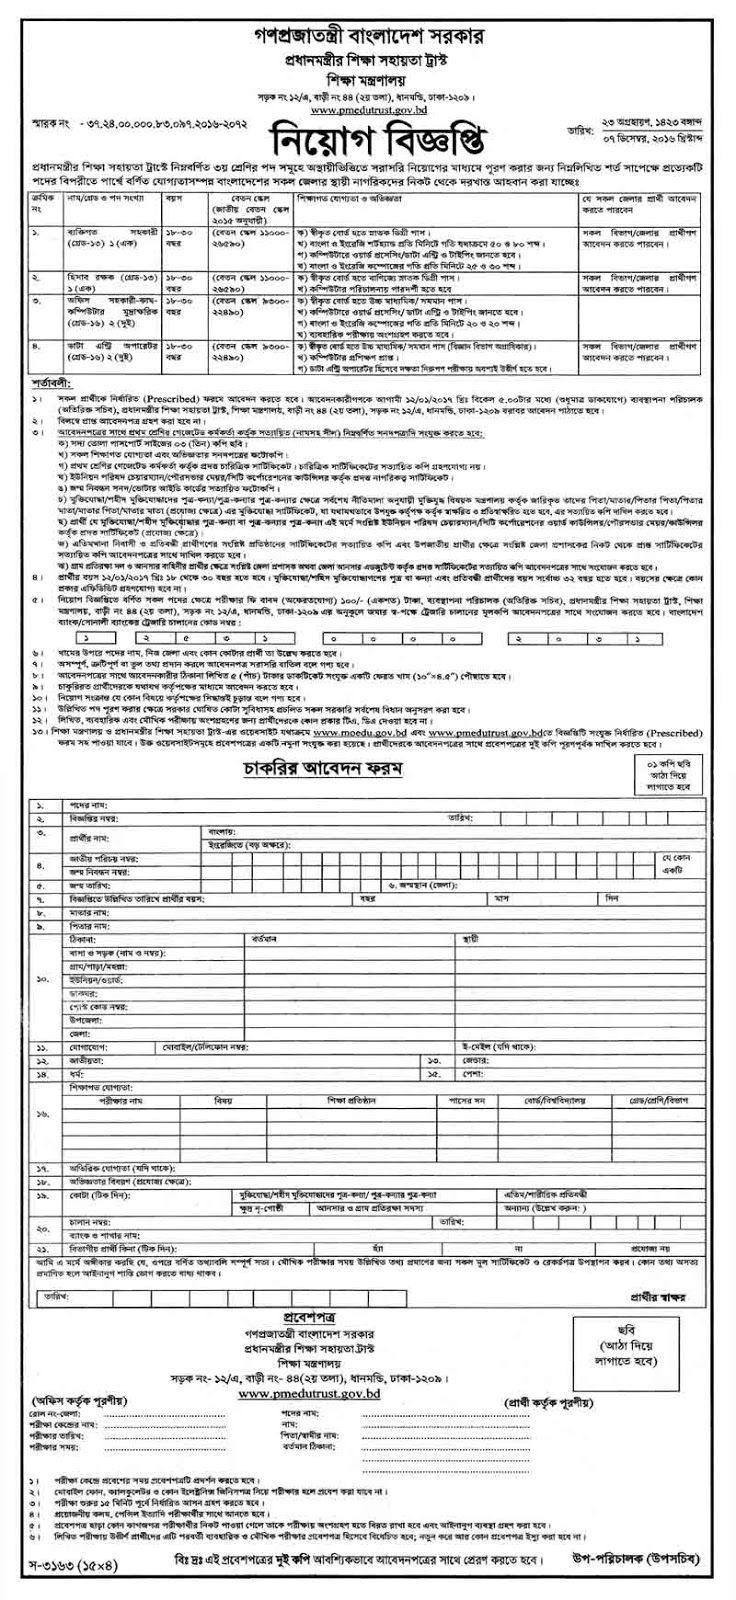 Pin by Naeem Hasan on Bd Info | Job circular, Education jobs, Job